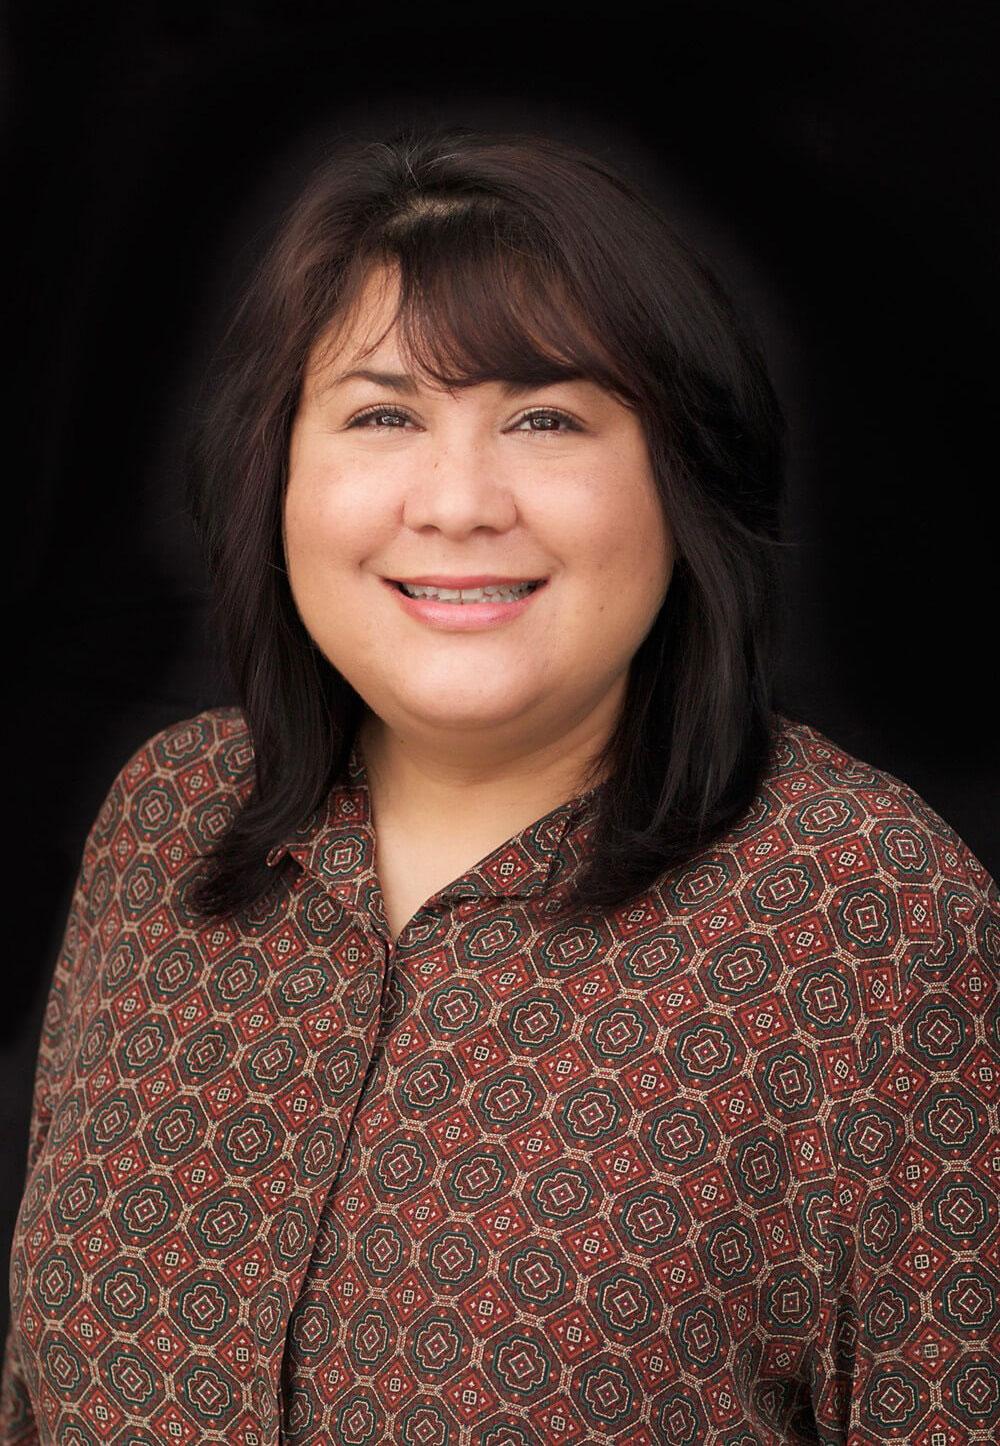 Kathy Guerrero